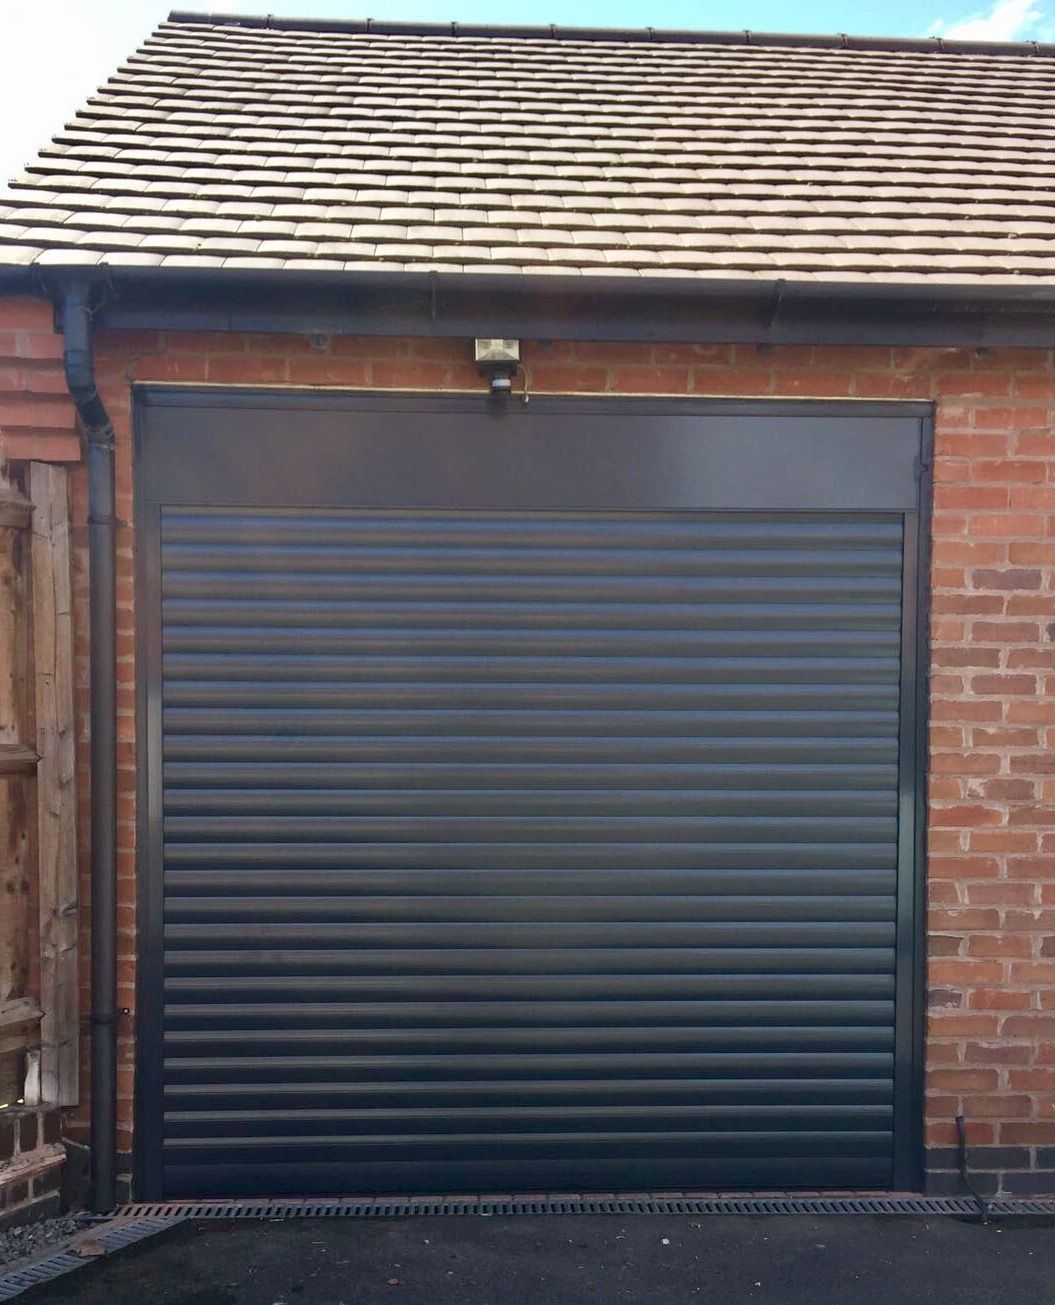 Alluguard Roller Door Anthracite Grey Ral 7016 Garage Roller